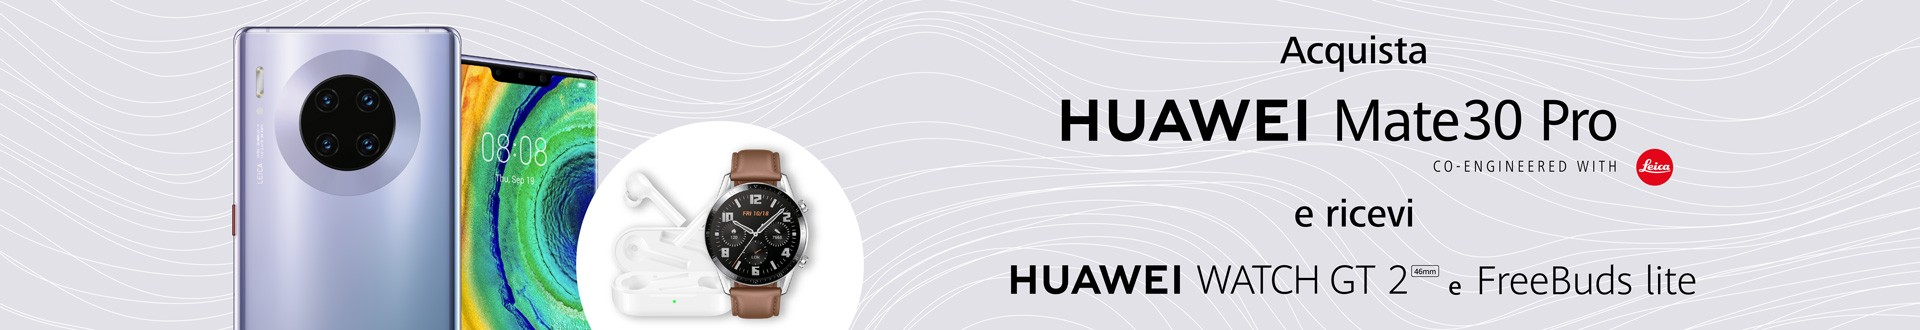 huawei mate 30 pro regalo watch gt 2 freebuds lite